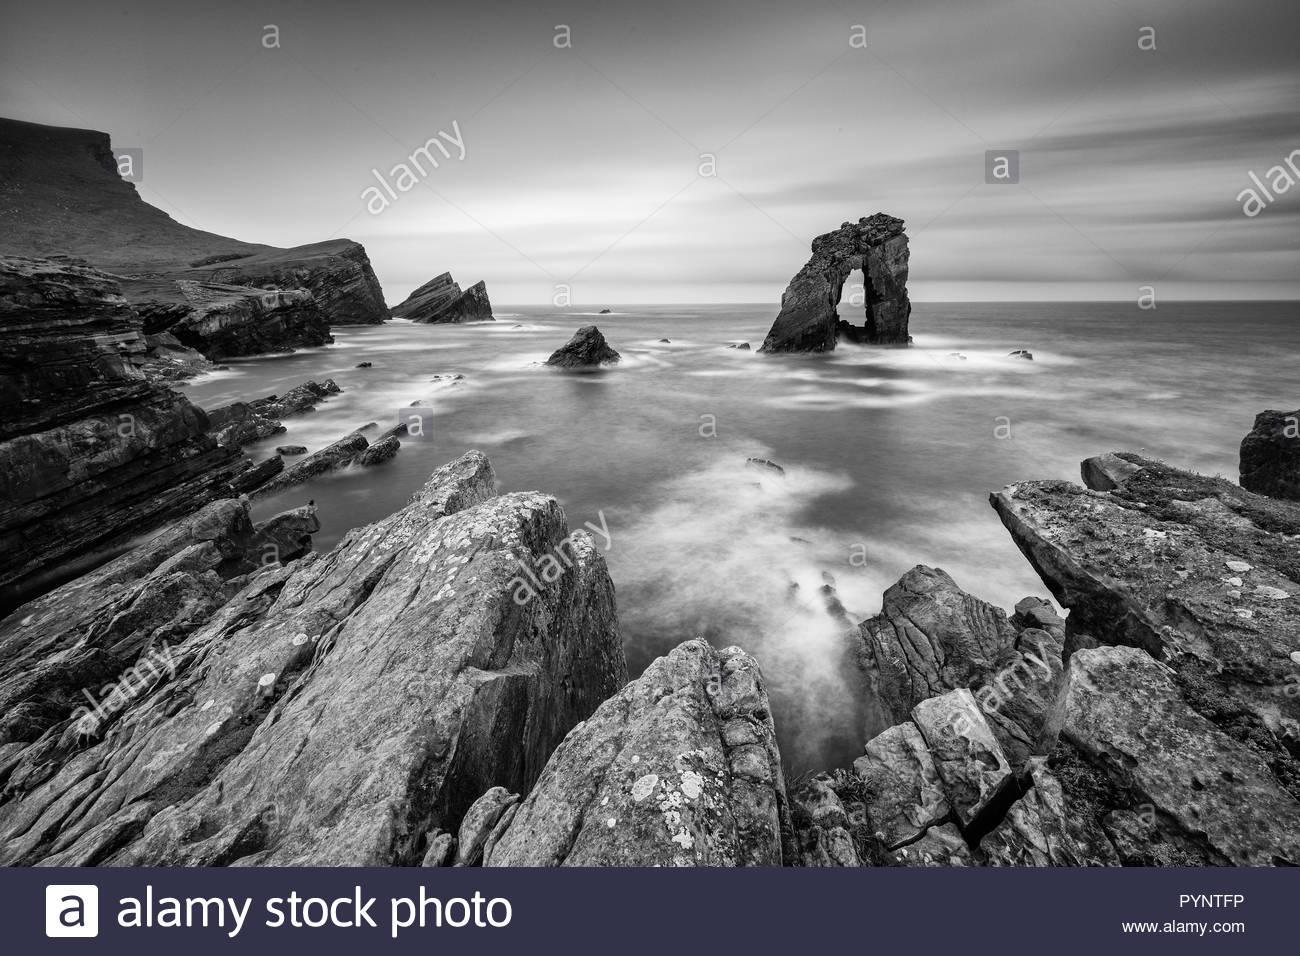 Gaada Stack, Foula, Shetland, Scotland, UK - Stock Image